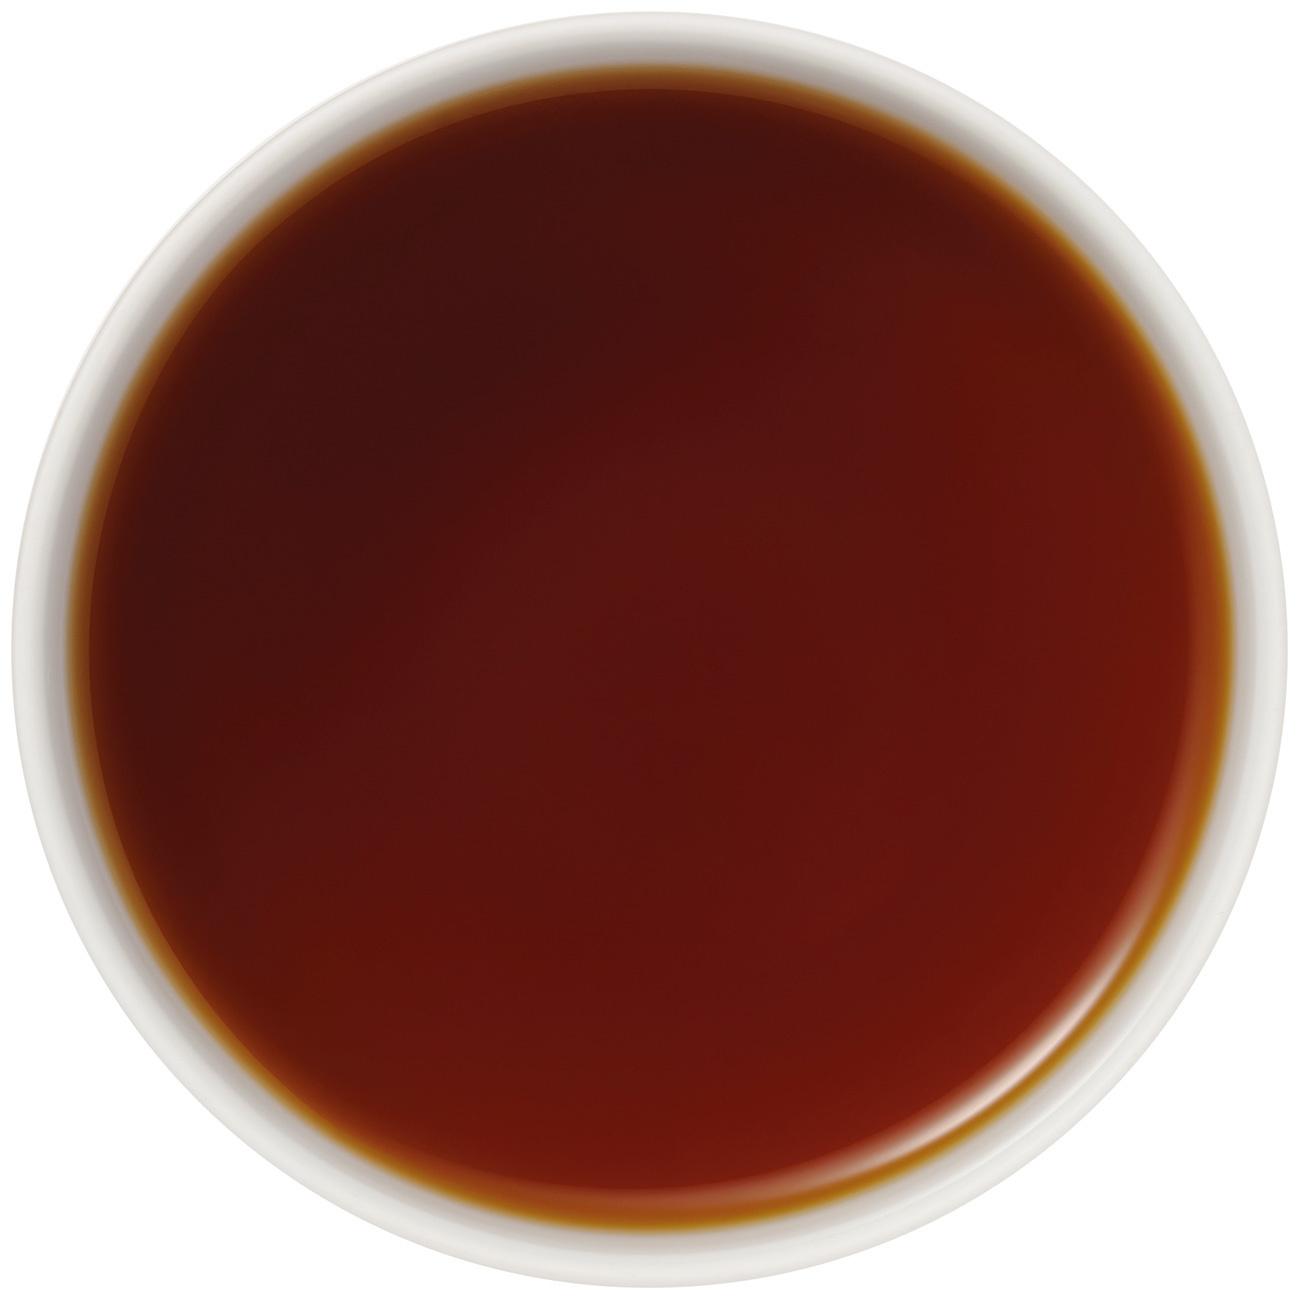 Redbush Pepper thee